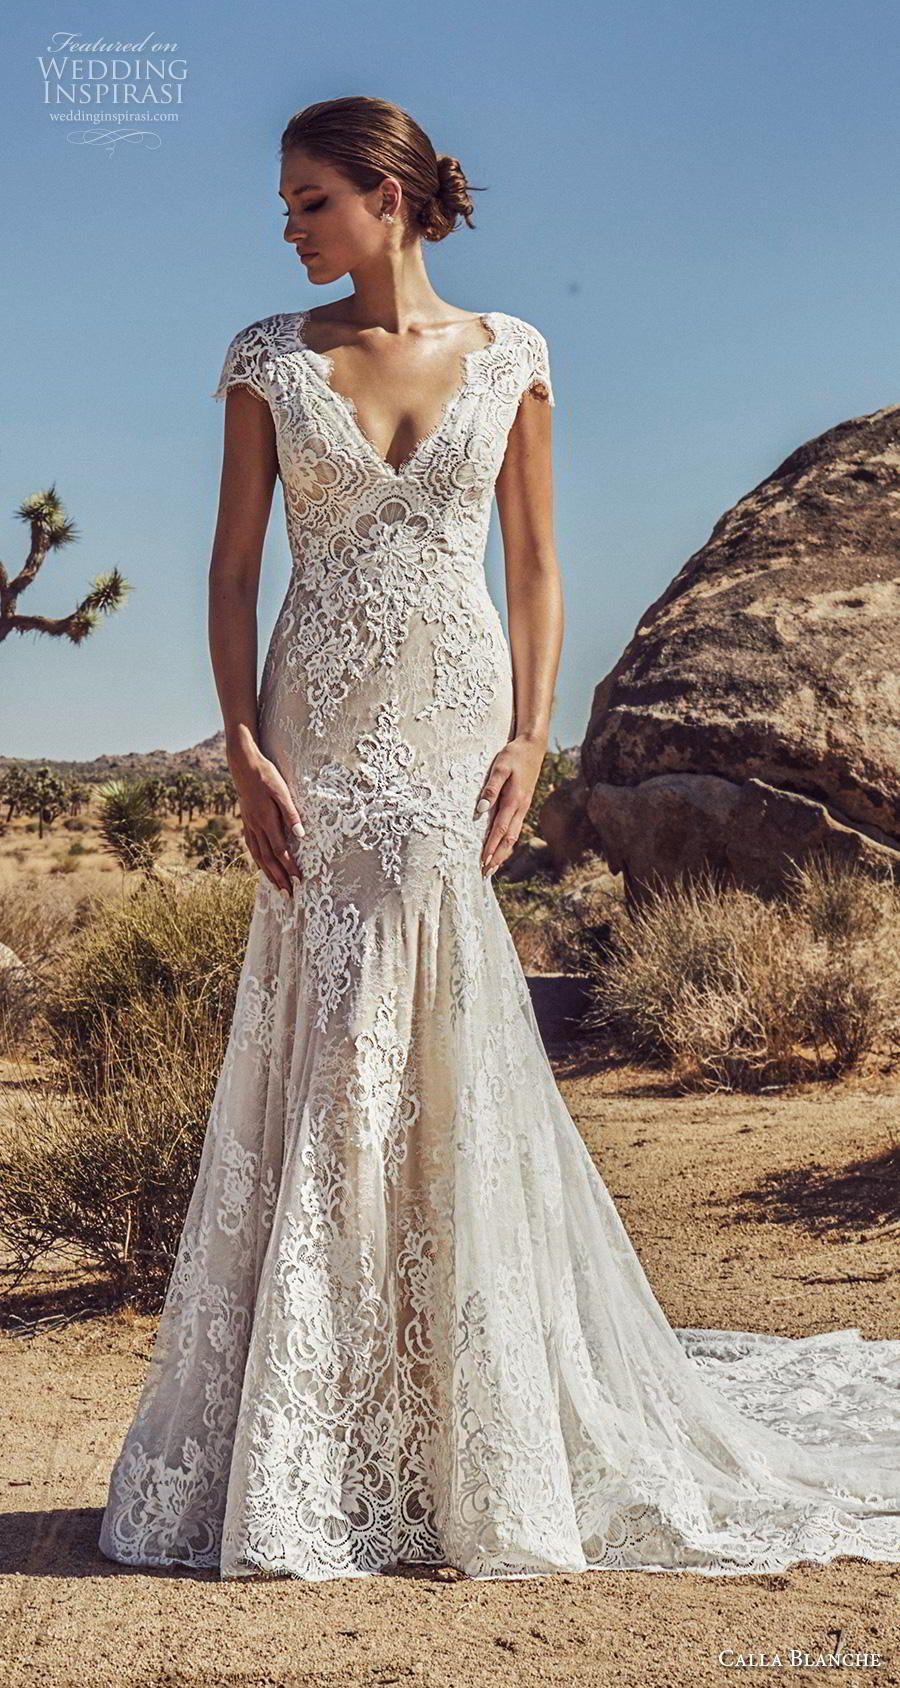 Calla Blanche Spring 2019 Wedding Dresses Wedding Inspirasi Wedding Dress Cap Sleeves V Neck Wedding Dress Mermaid Dresses [ 1688 x 900 Pixel ]